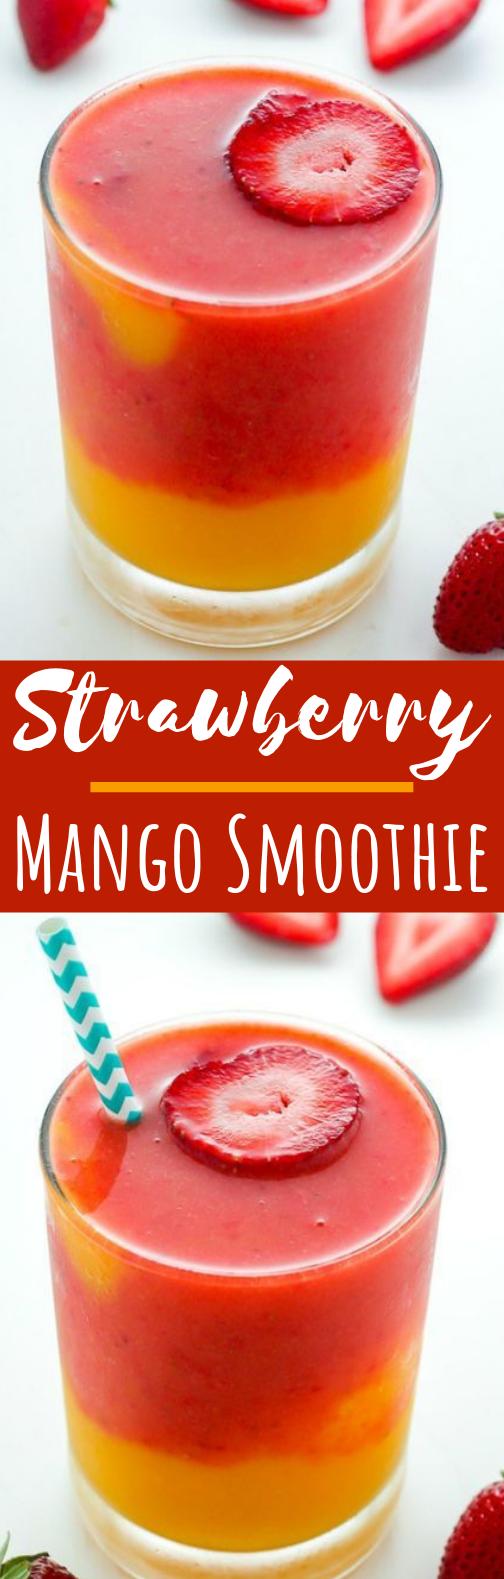 Strawberry Mango Smoothie #drinks #smoothies